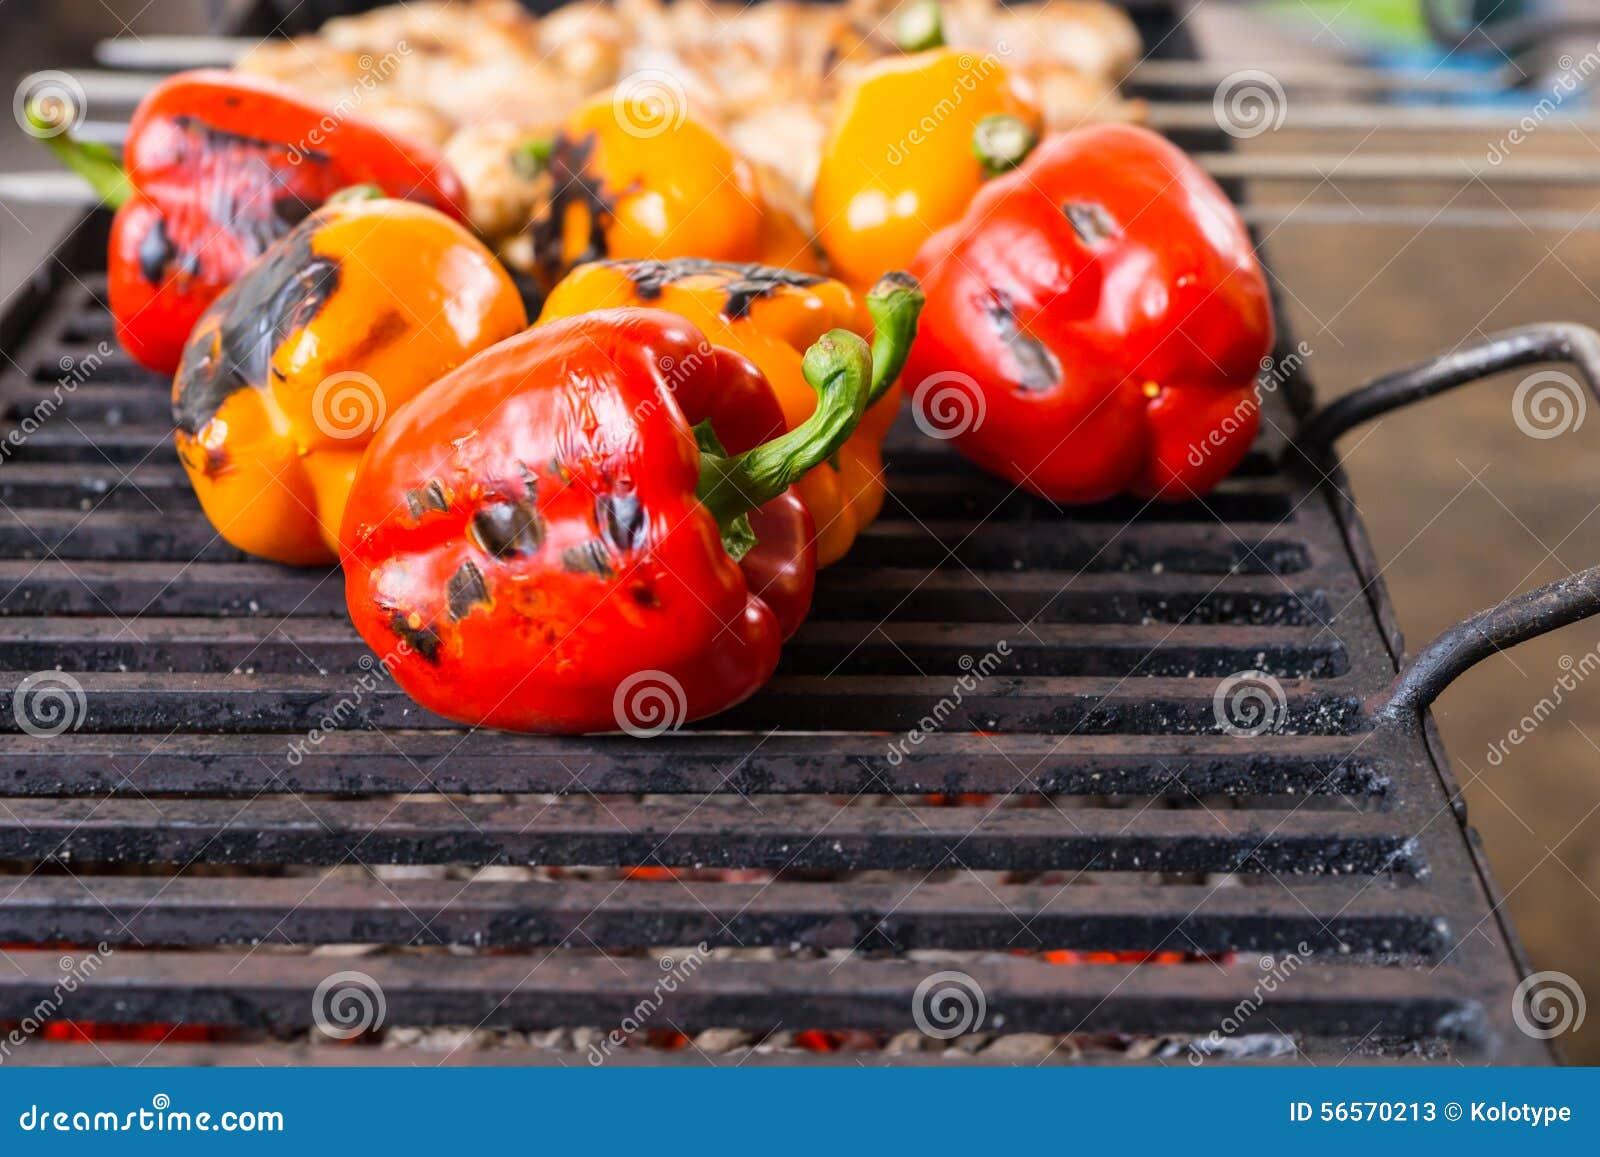 Download Κόκκινα και πορτοκαλιά πιπέρια που μαγειρεύουν στην υπαίθρια σχάρα Στοκ Εικόνα - εικόνα από κόκκινος, ατρόπων: 56570213